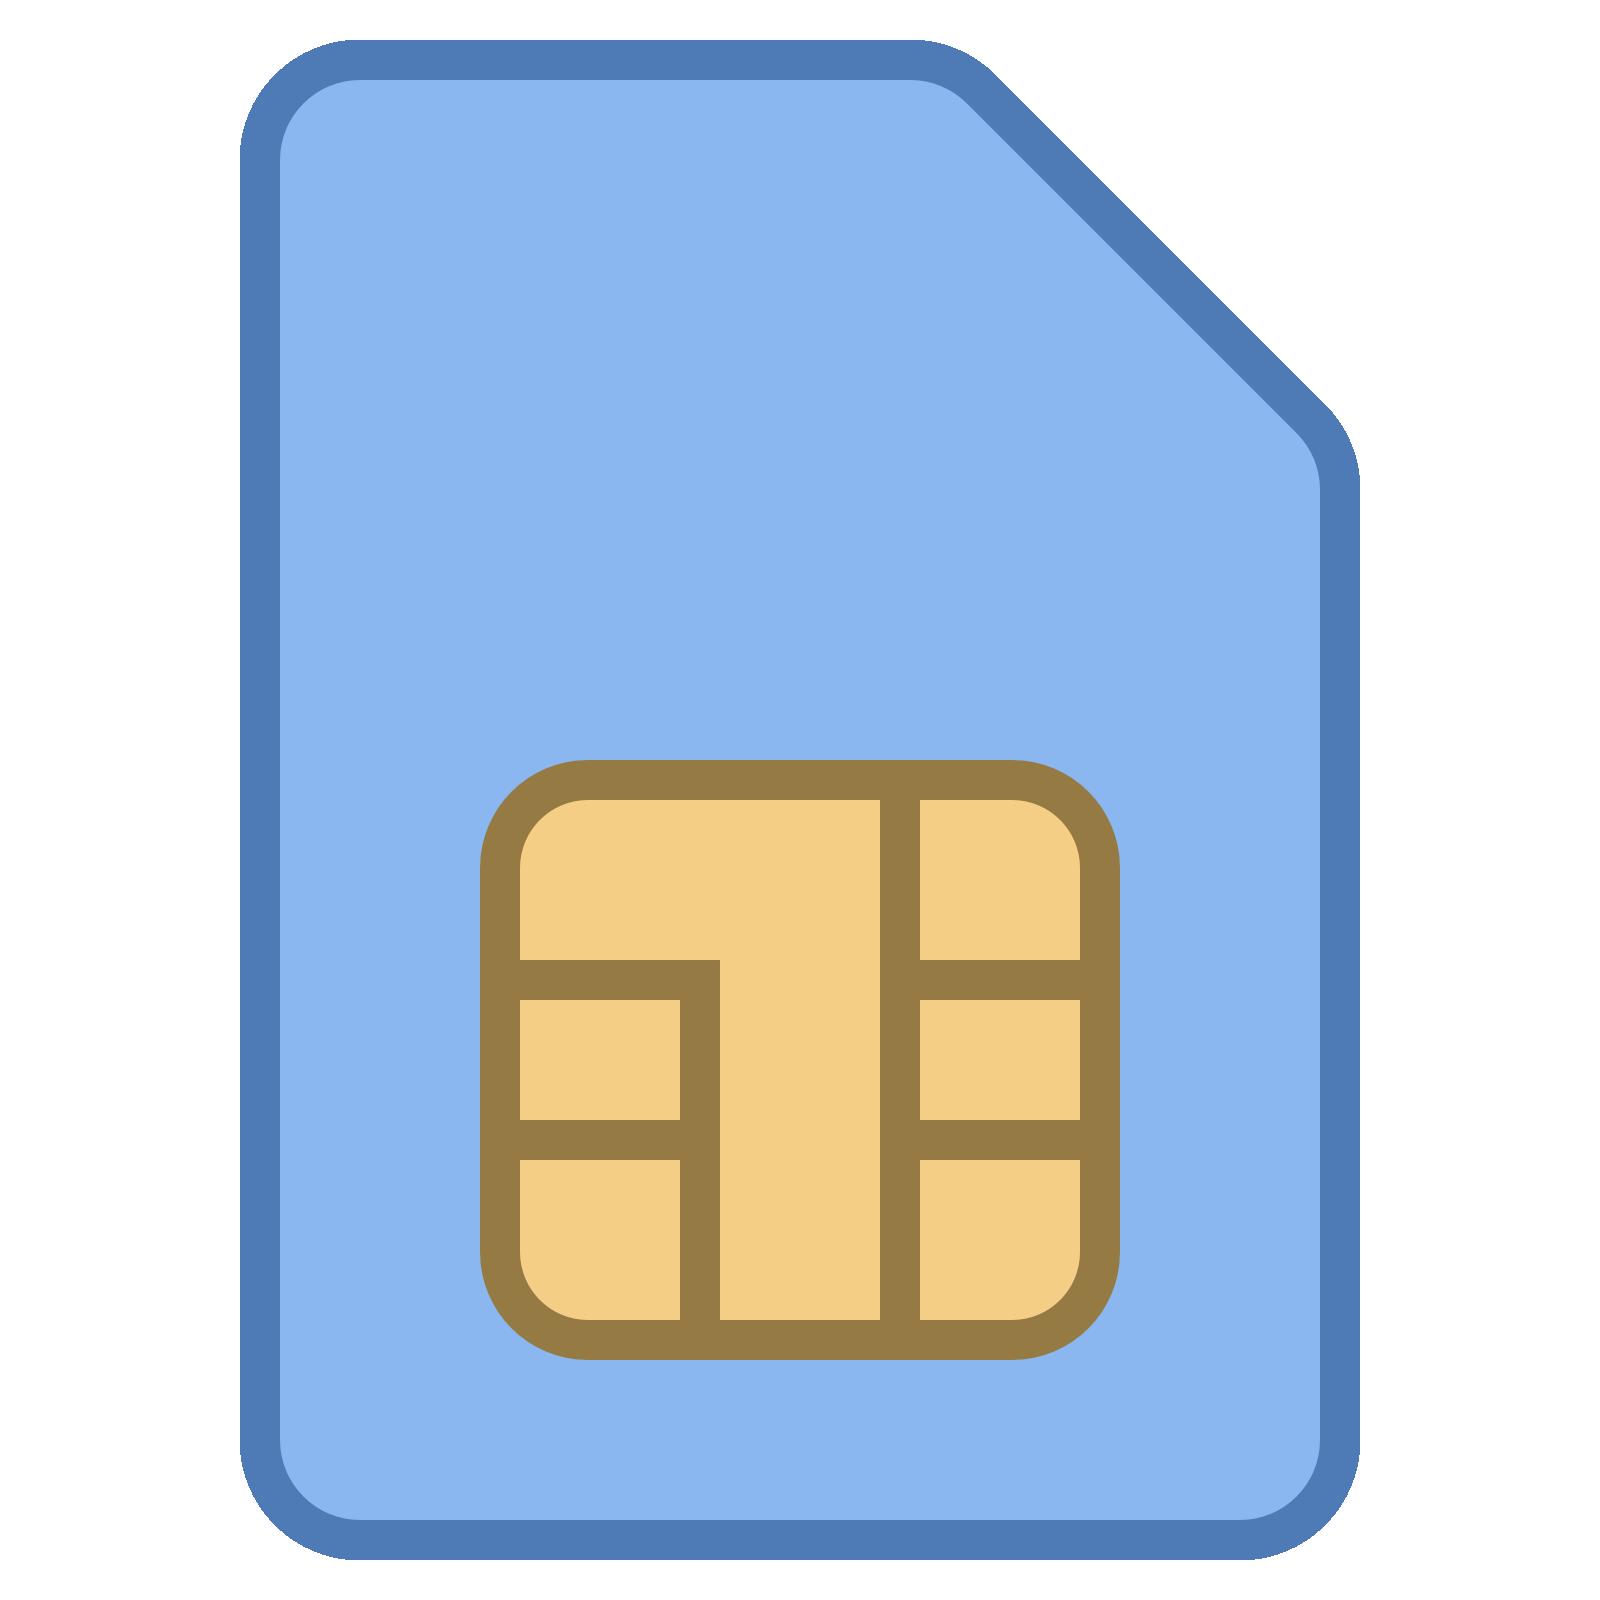 Idea clipart sim Icon Icons8 Card Download Card